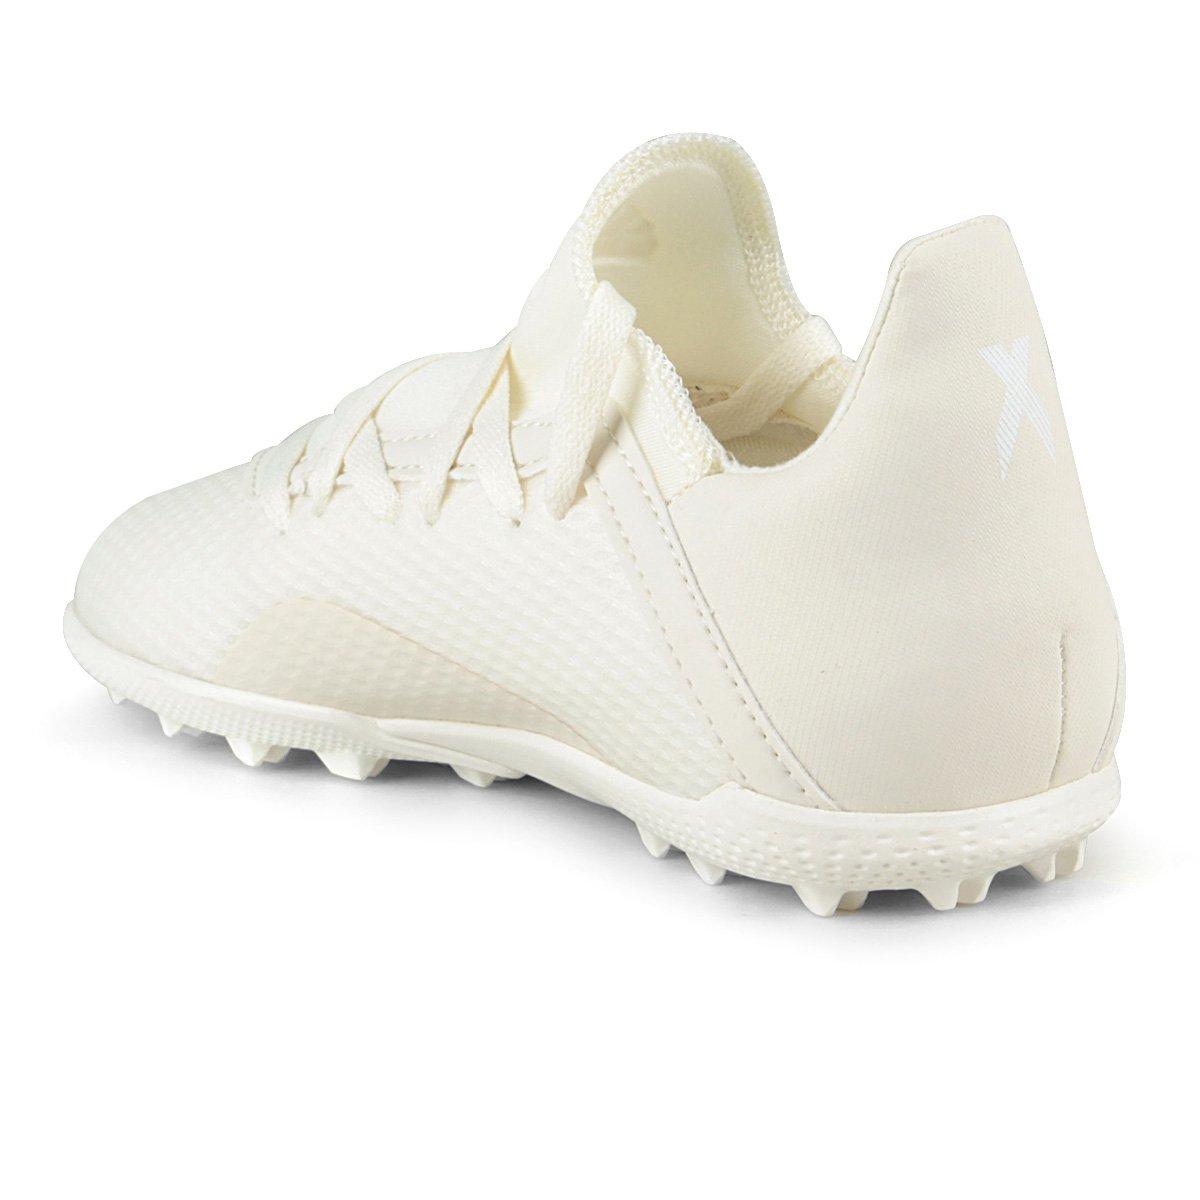 6c3b4b2eb5779 Foto 2 - Chuteira Society Infantil Adidas X Tango 18 3 TF